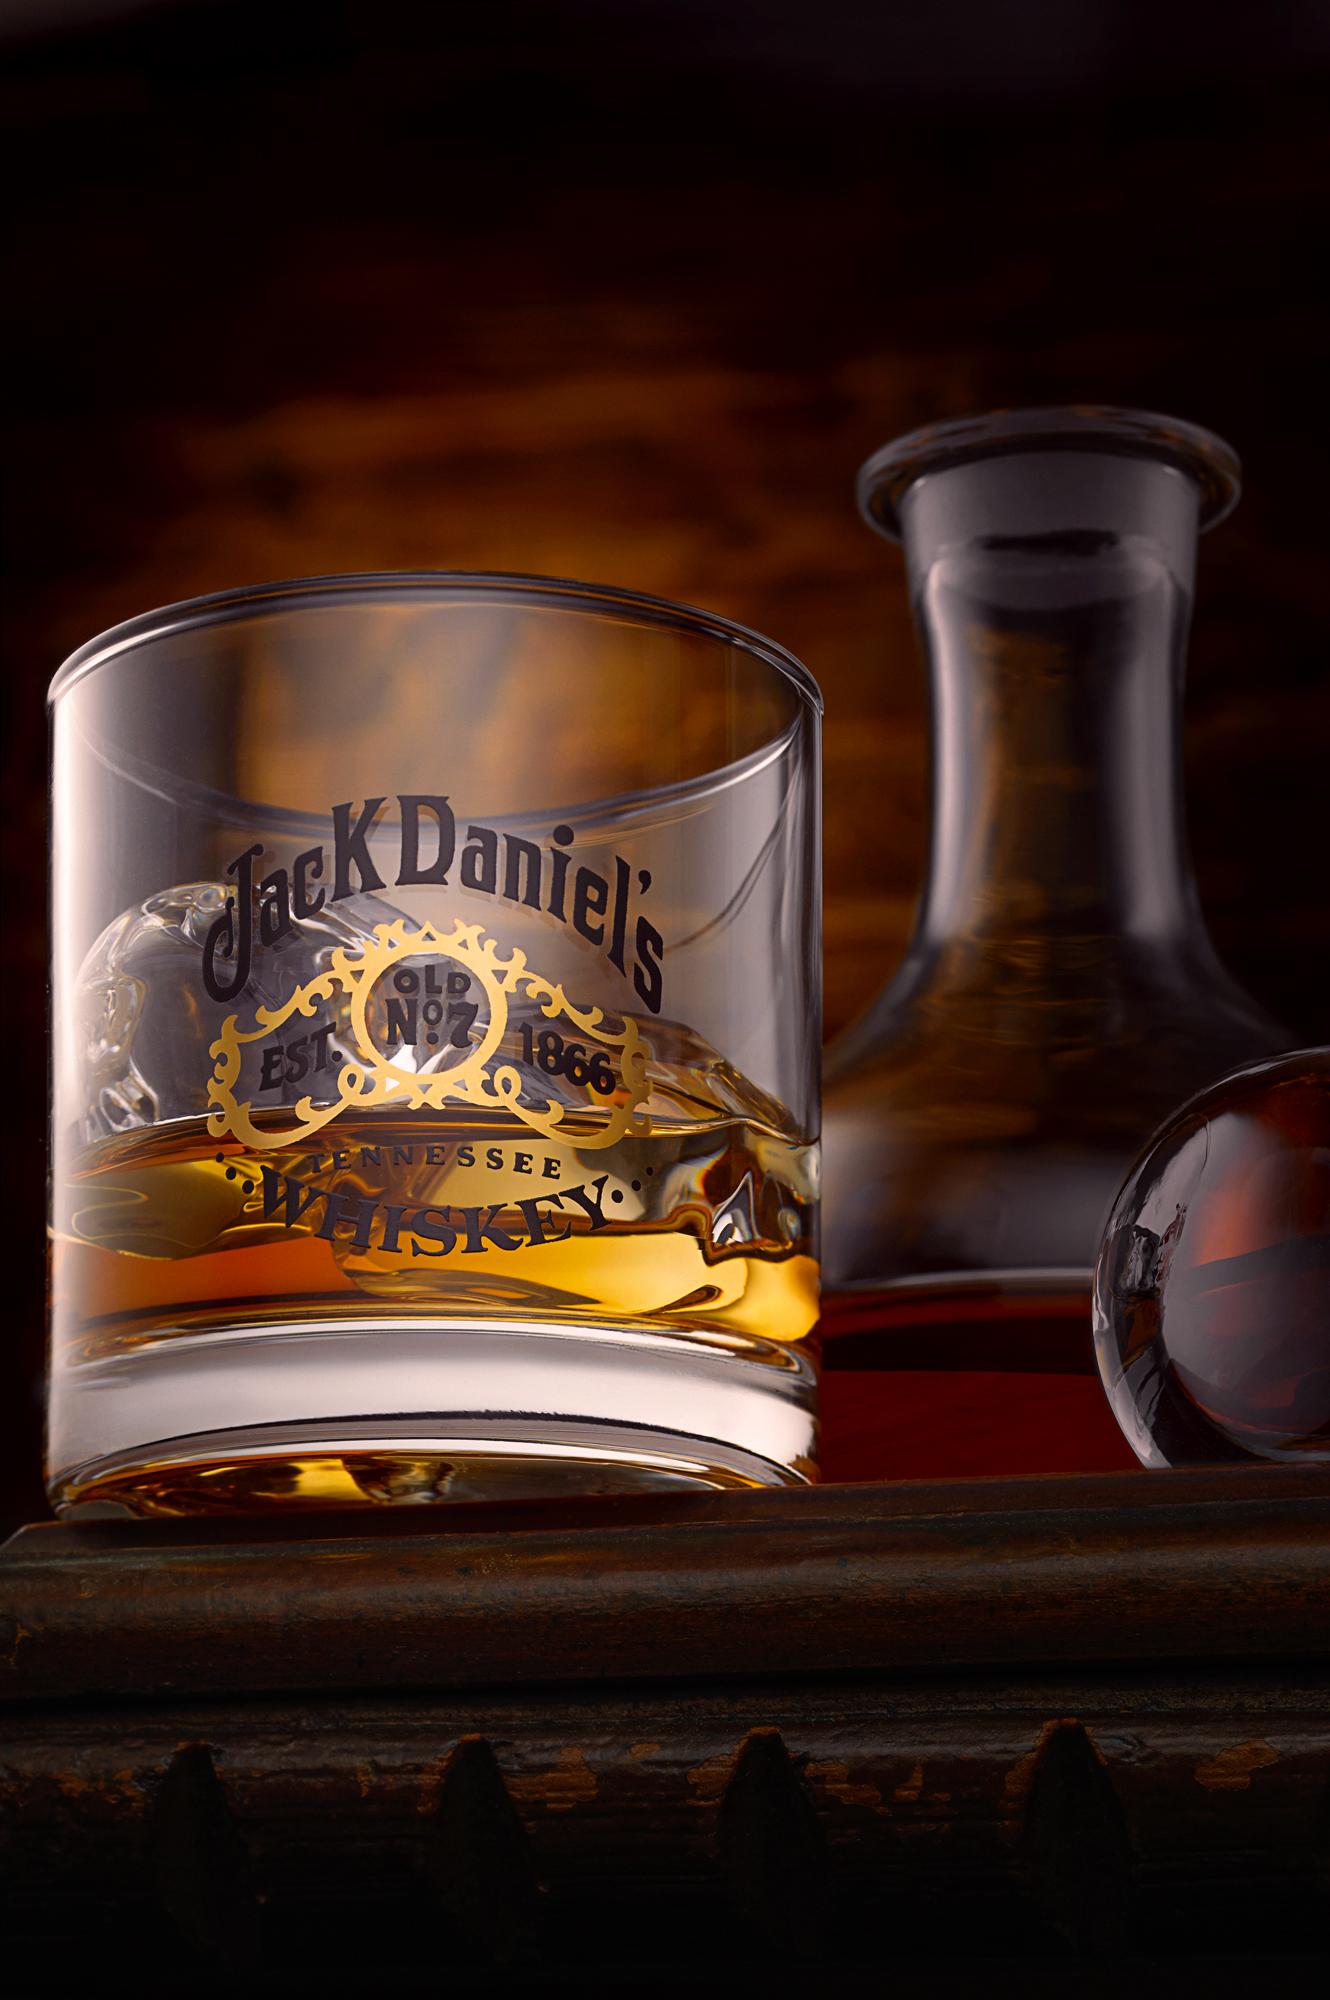 Jack Daniel's Old #7 Whiskey